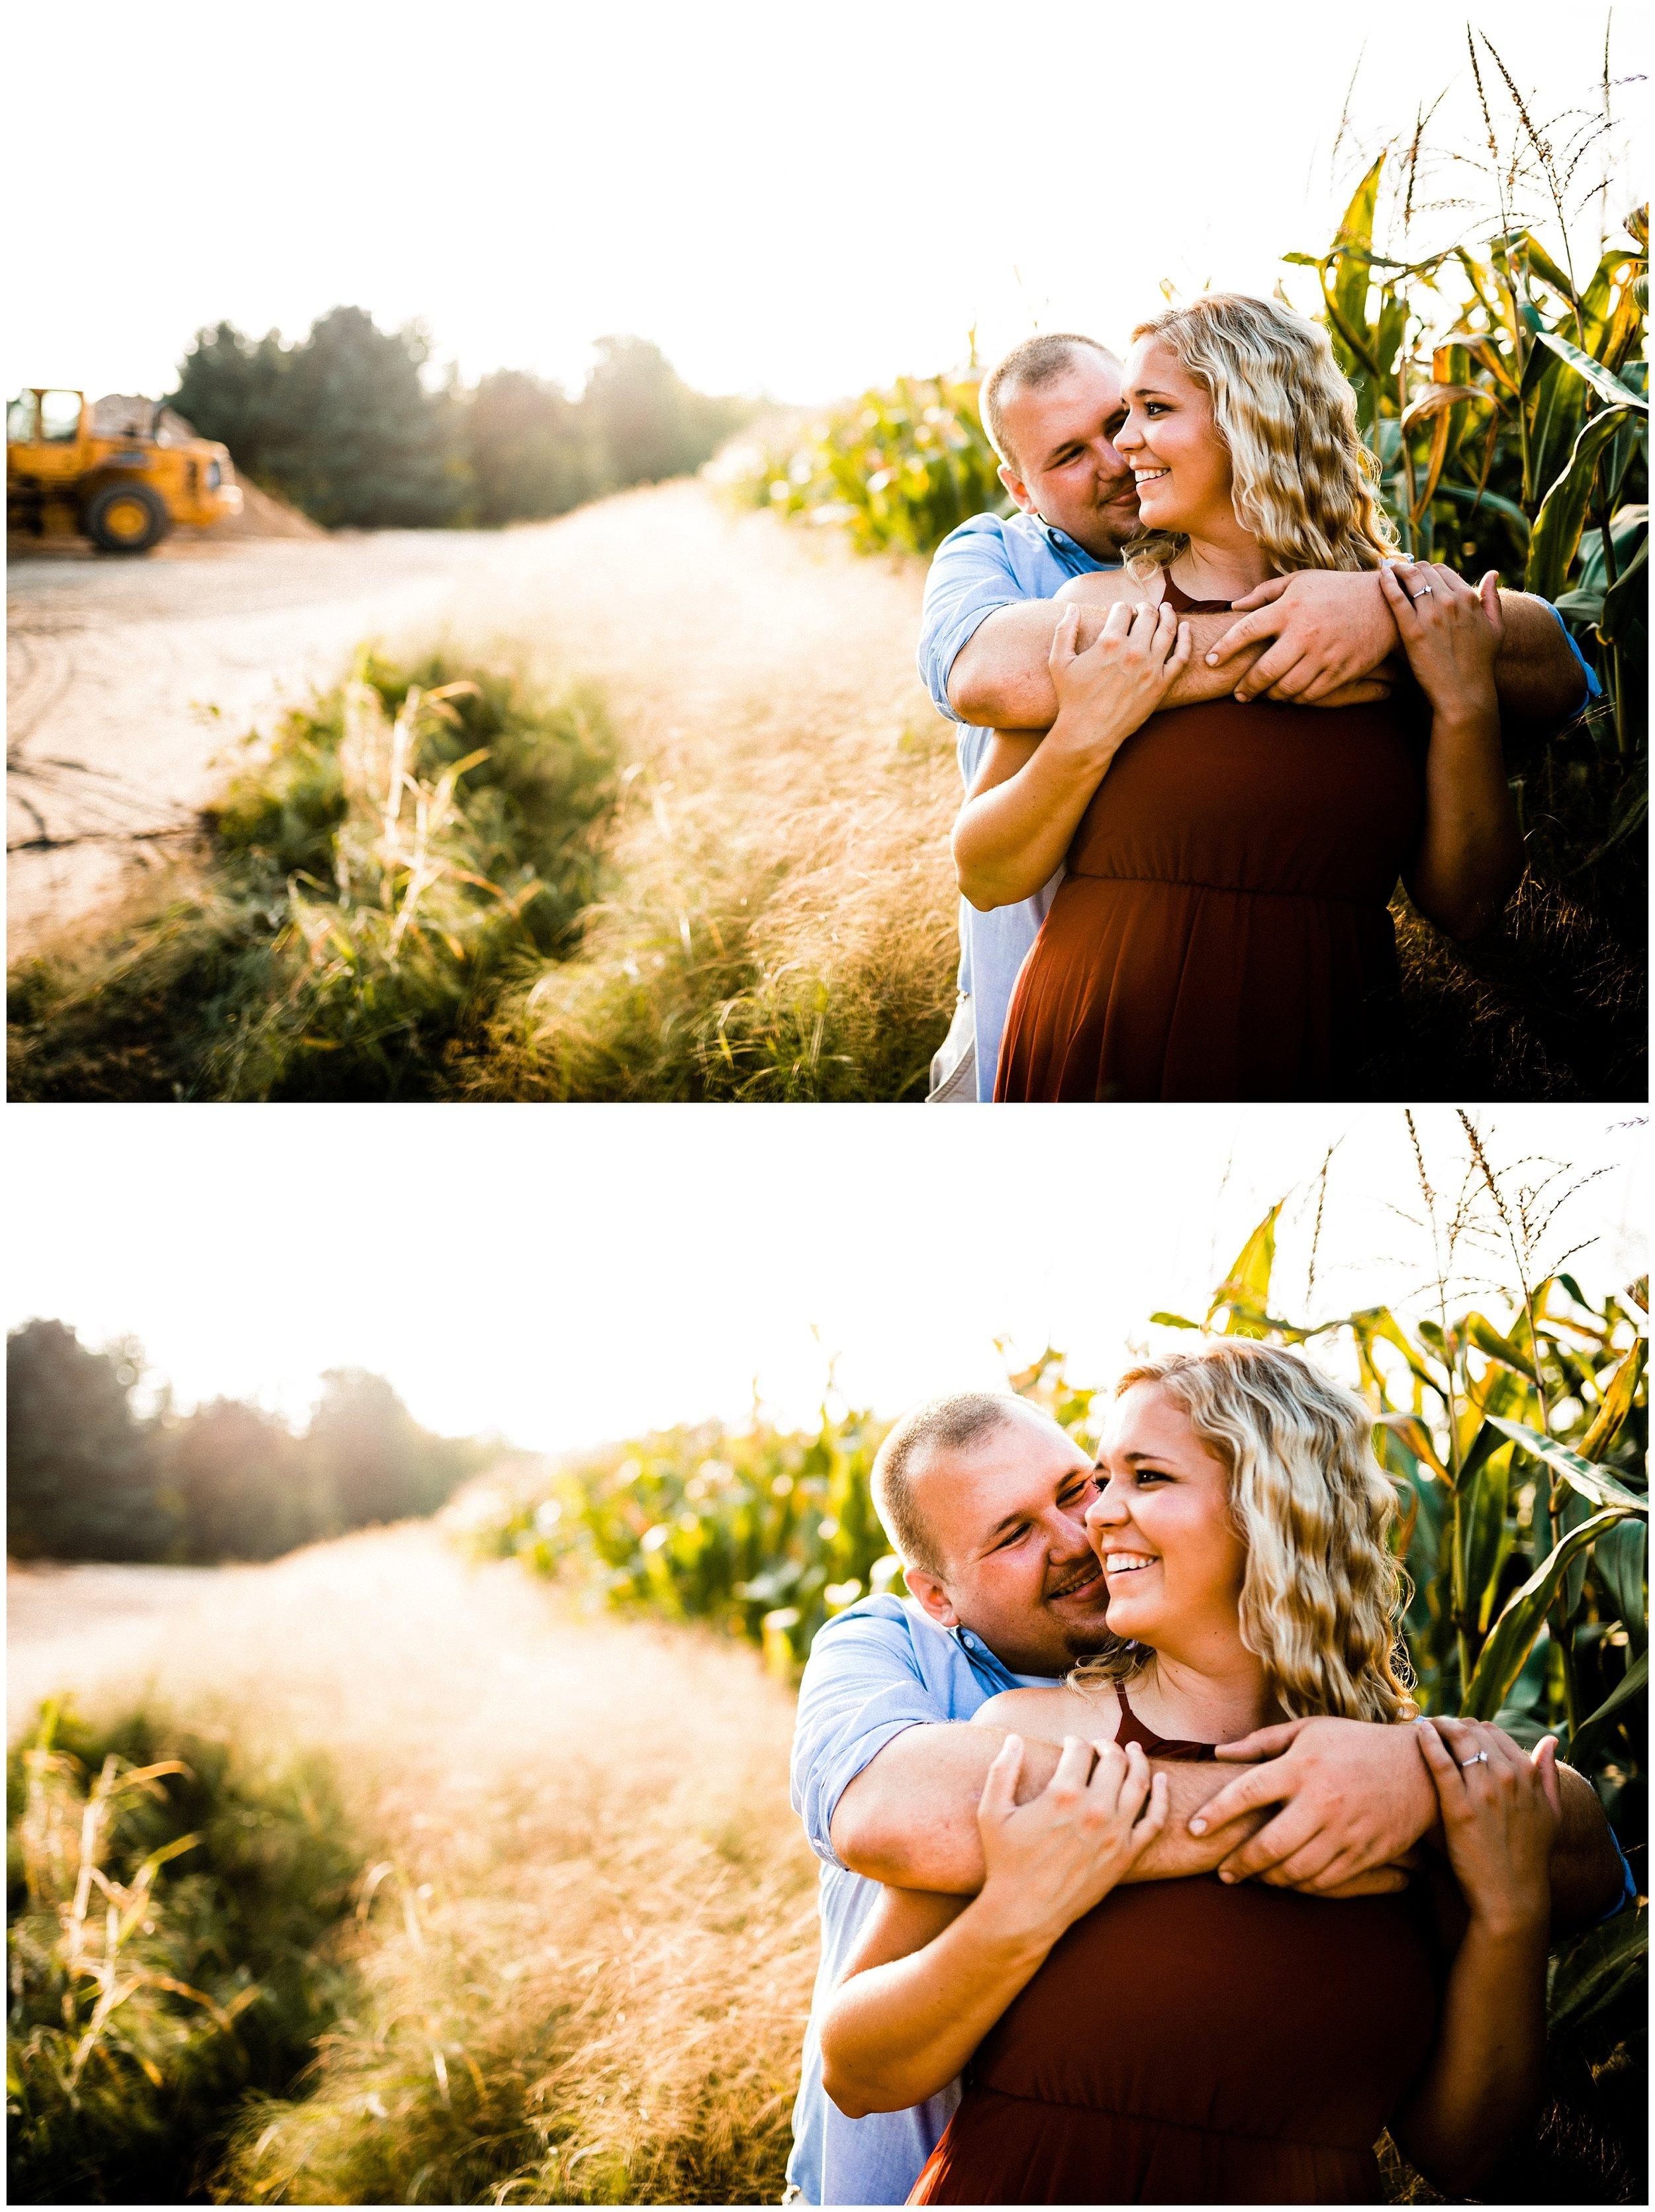 Nate + Tamryn | Engaged #kyleepaigephotography_1028.jpg